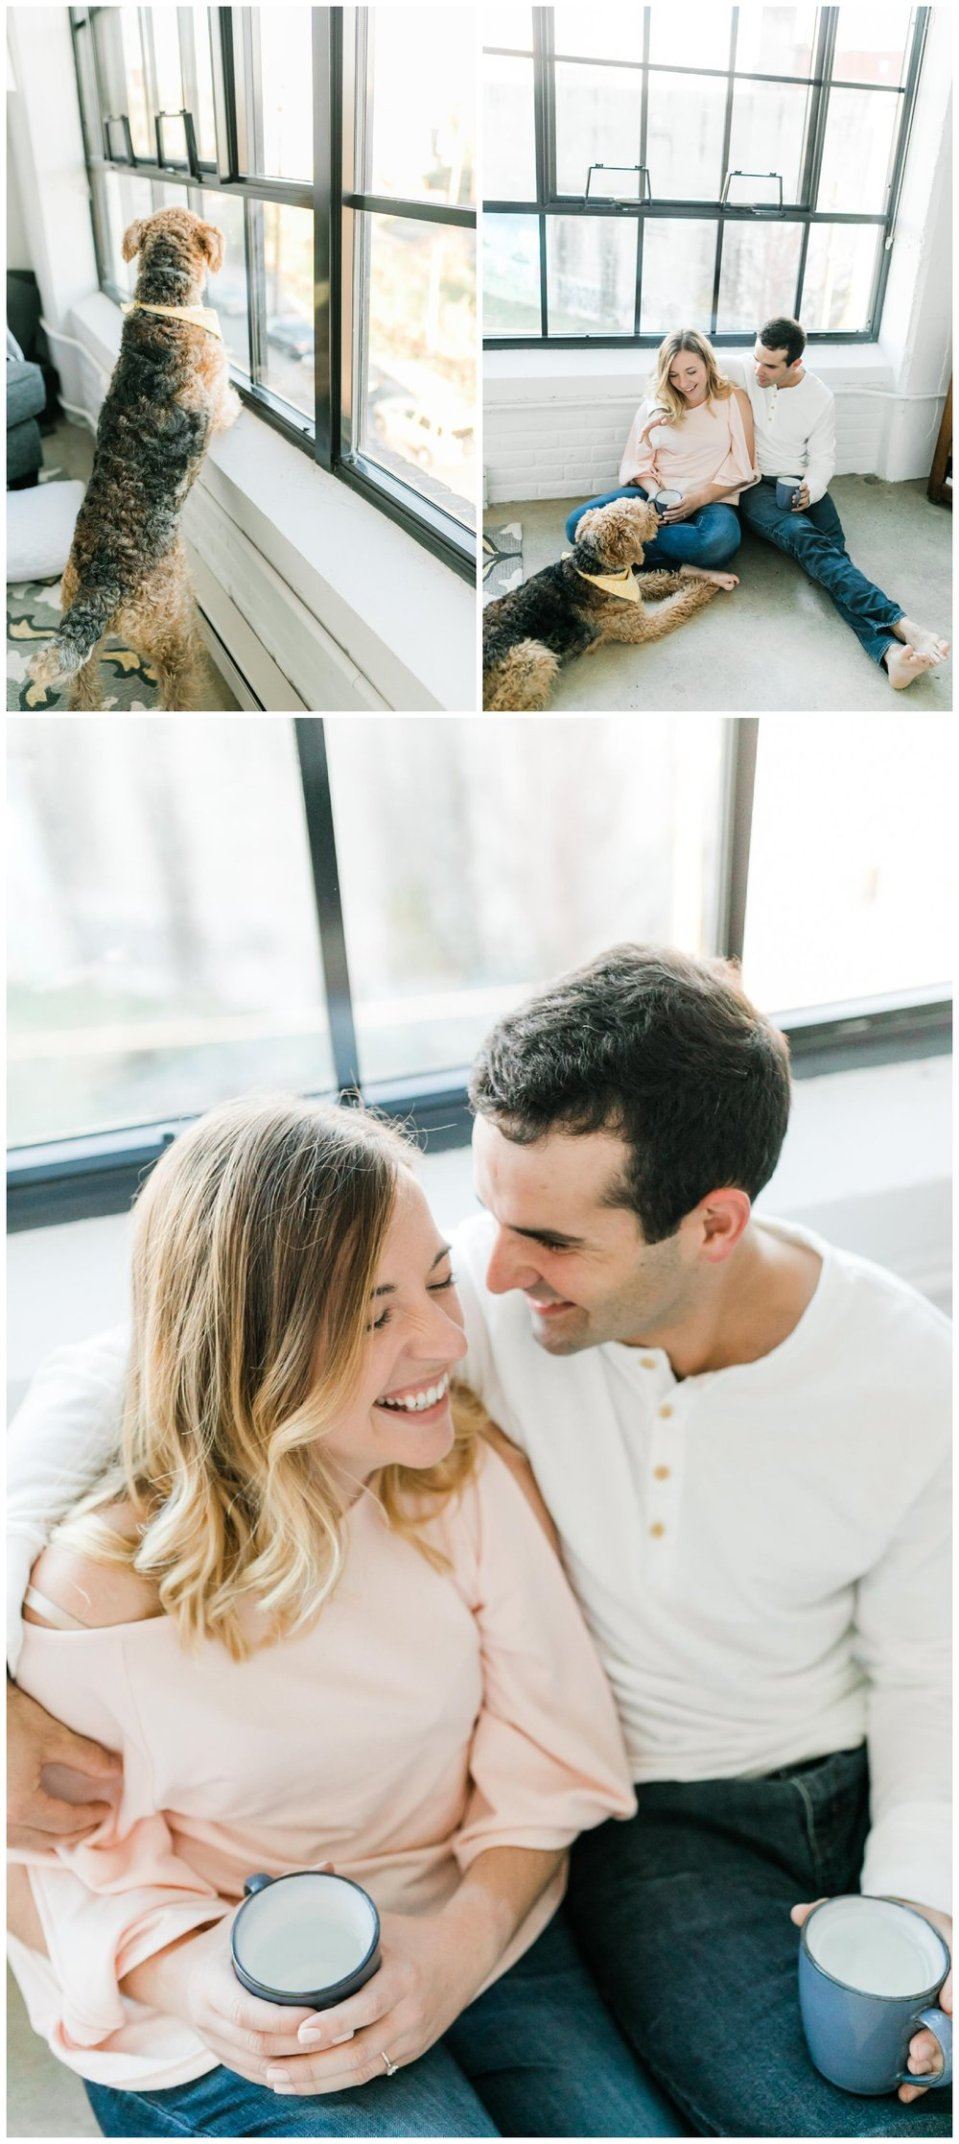 SabrinaandTim PhiladelphiaEngagement Engagement Philadelphia PA Wedding Photographer MagdalenaStudio 25